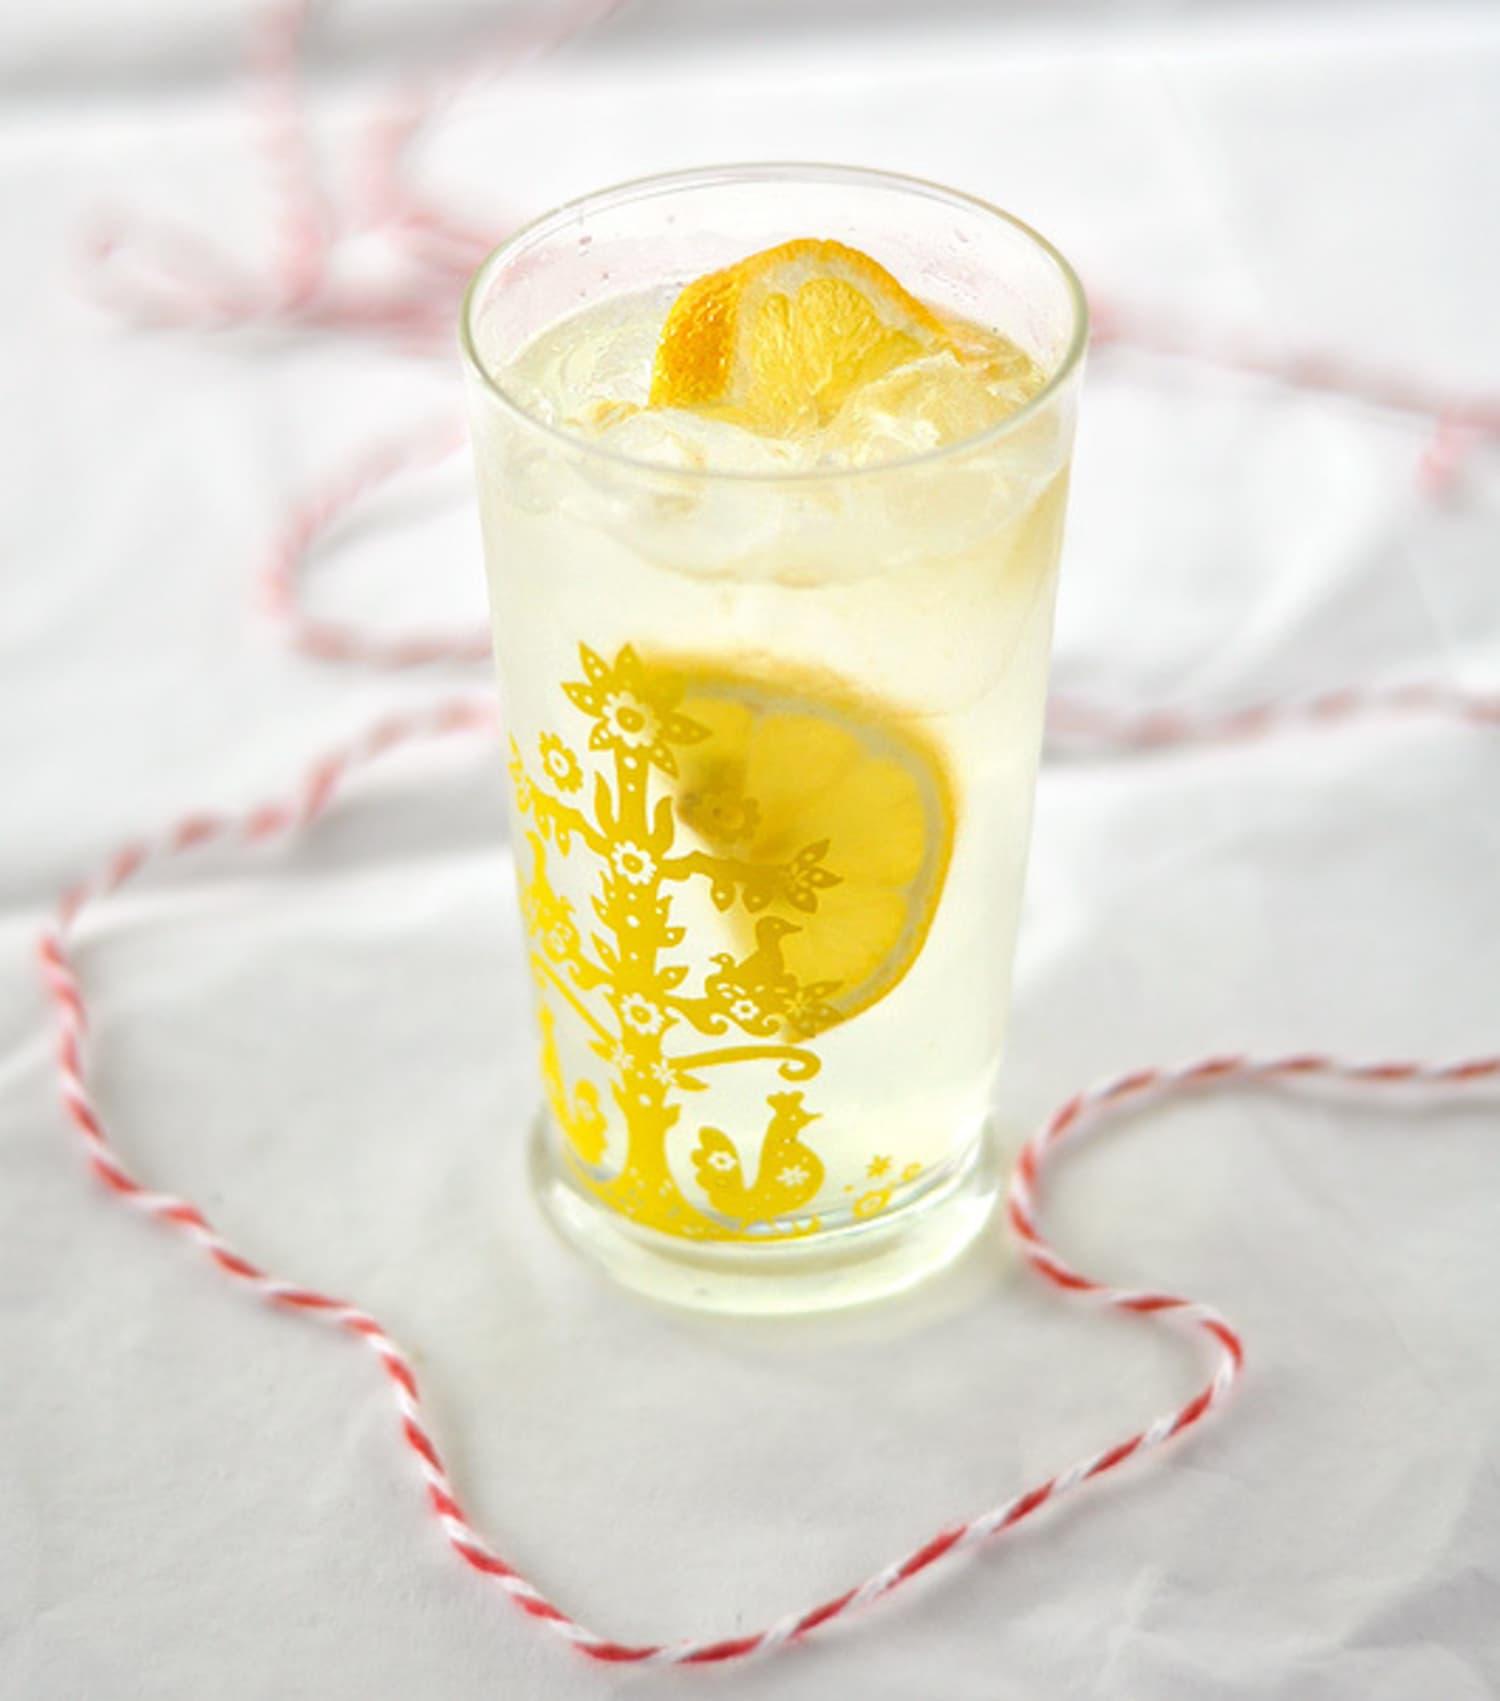 How To Make Lemon Shake Ups at Home Street Fair Food Week